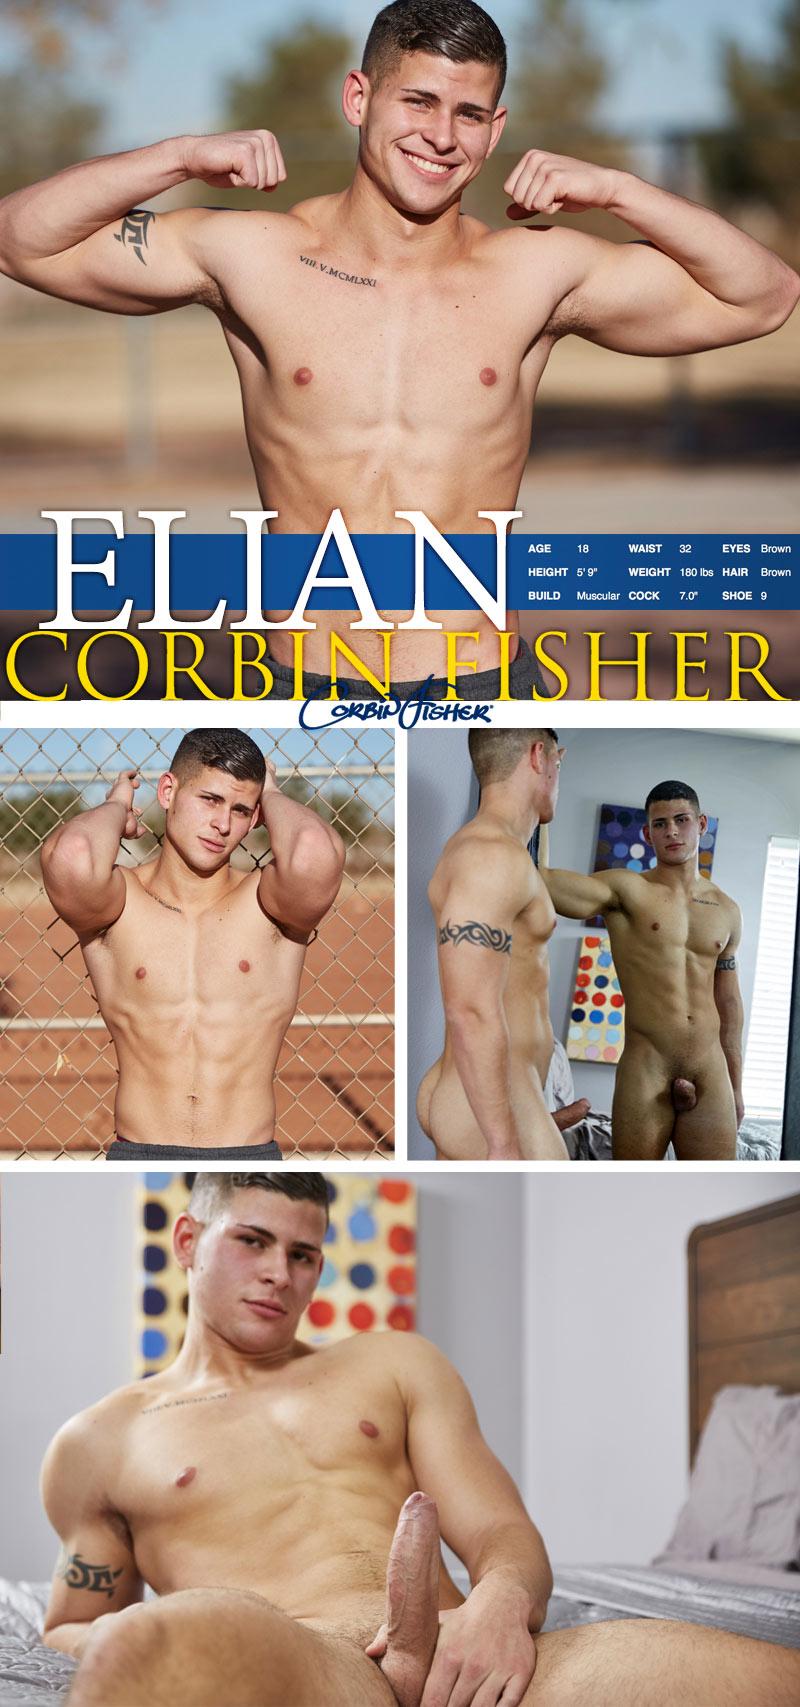 Elian at CorbinFisher